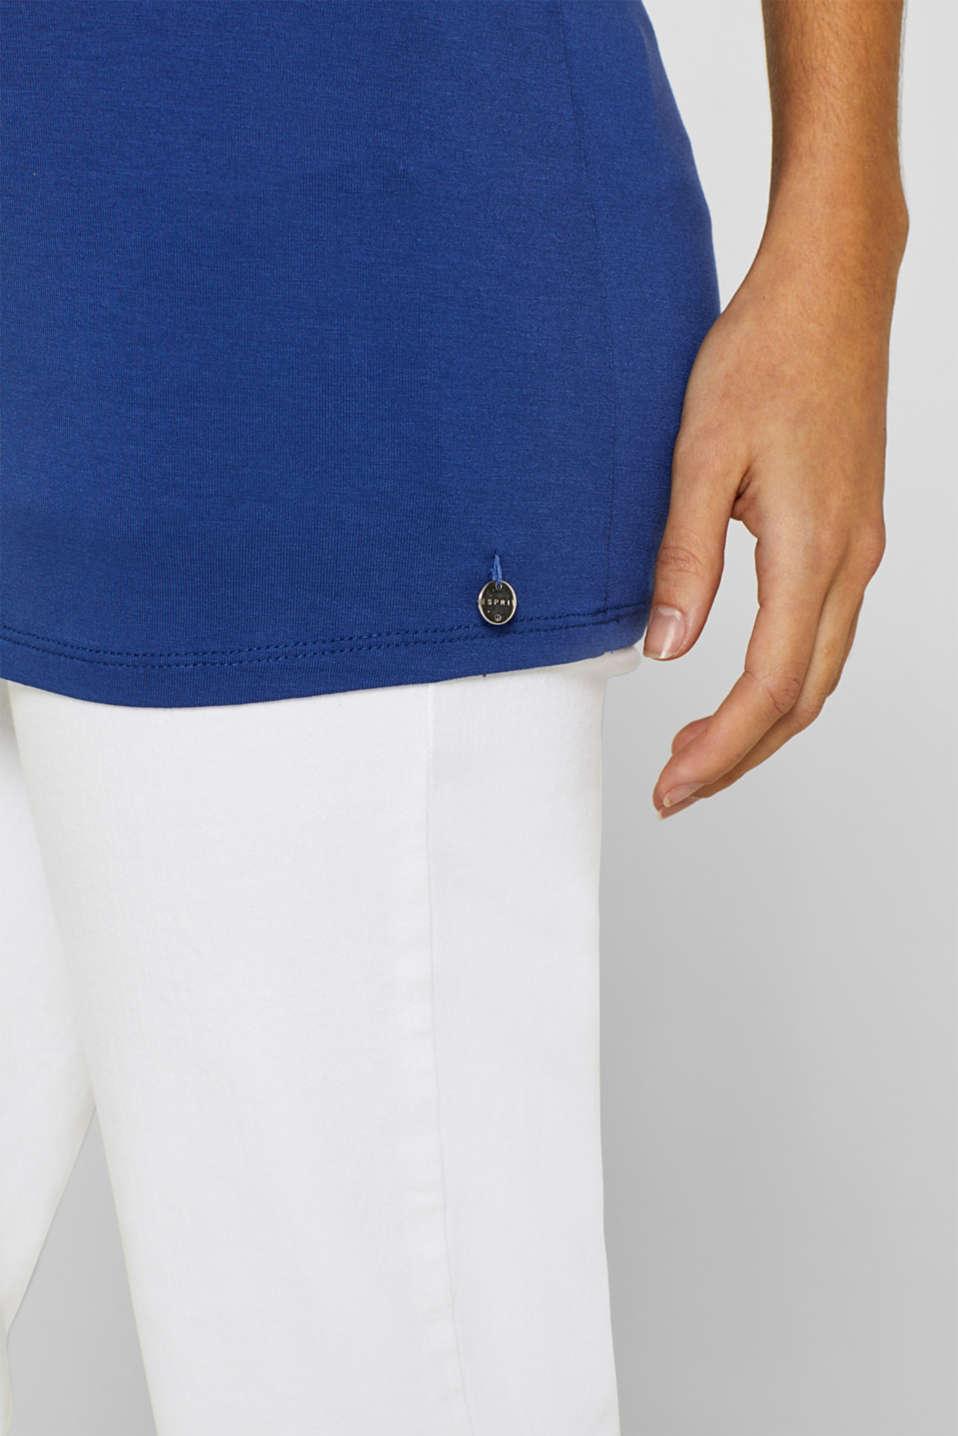 Layered-effect stretch nursing top, LCDARK BLUE, detail image number 5